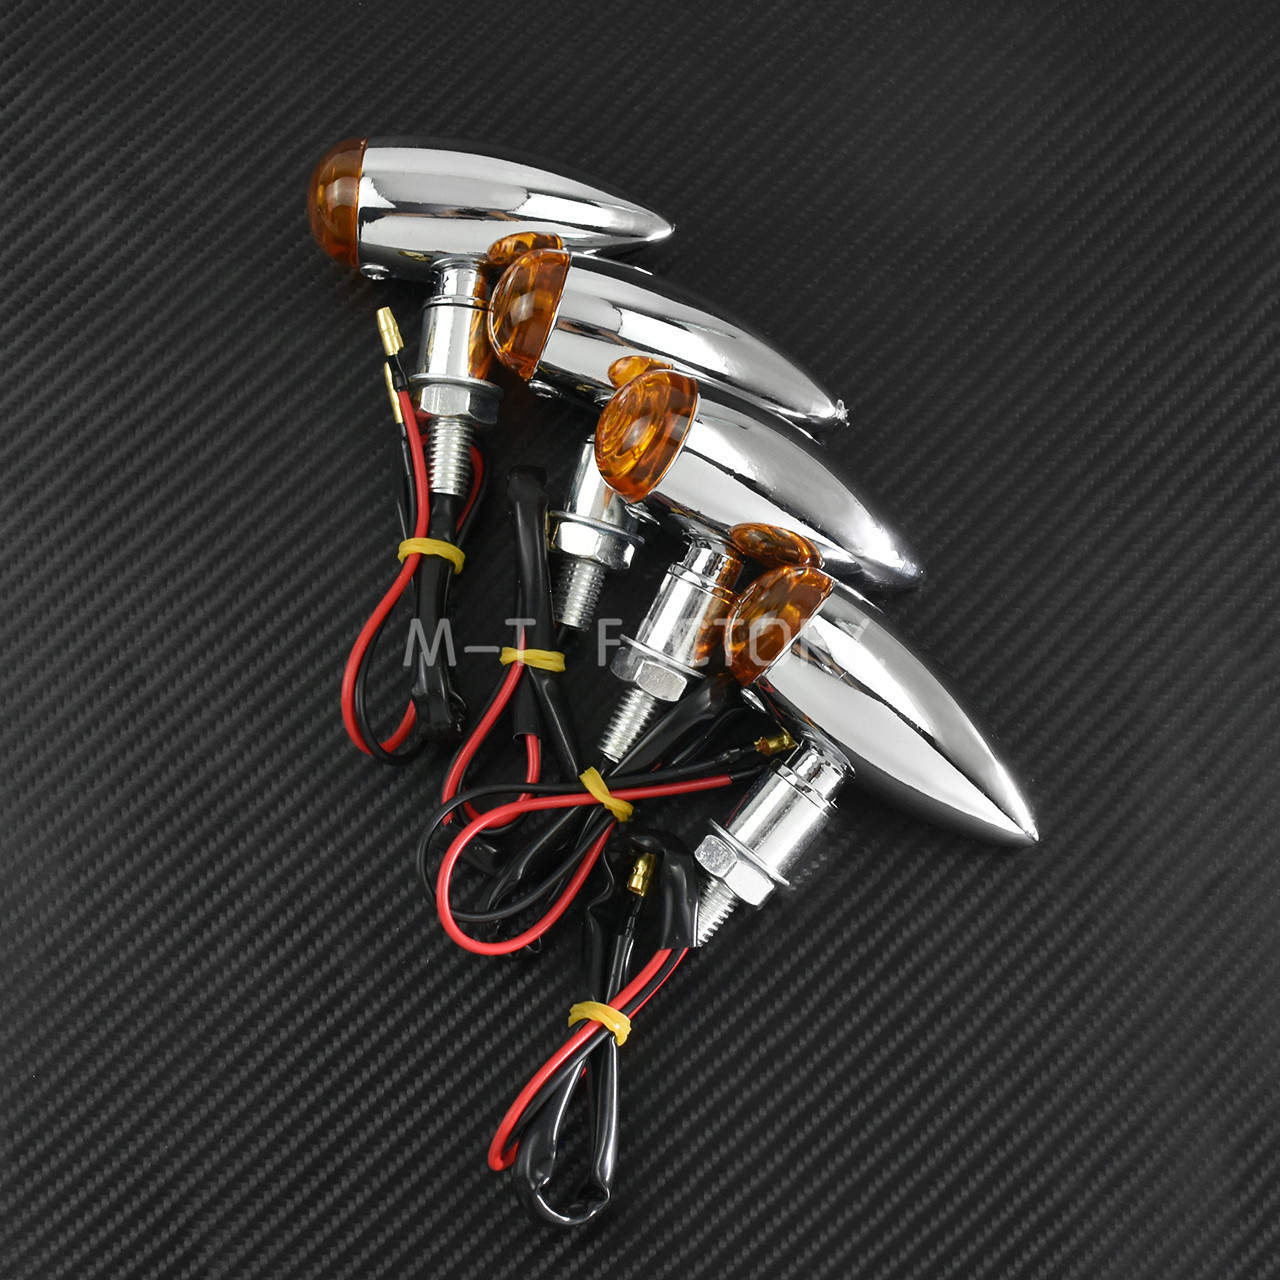 Sinal de seta para motocicleta, lâmpada cromada